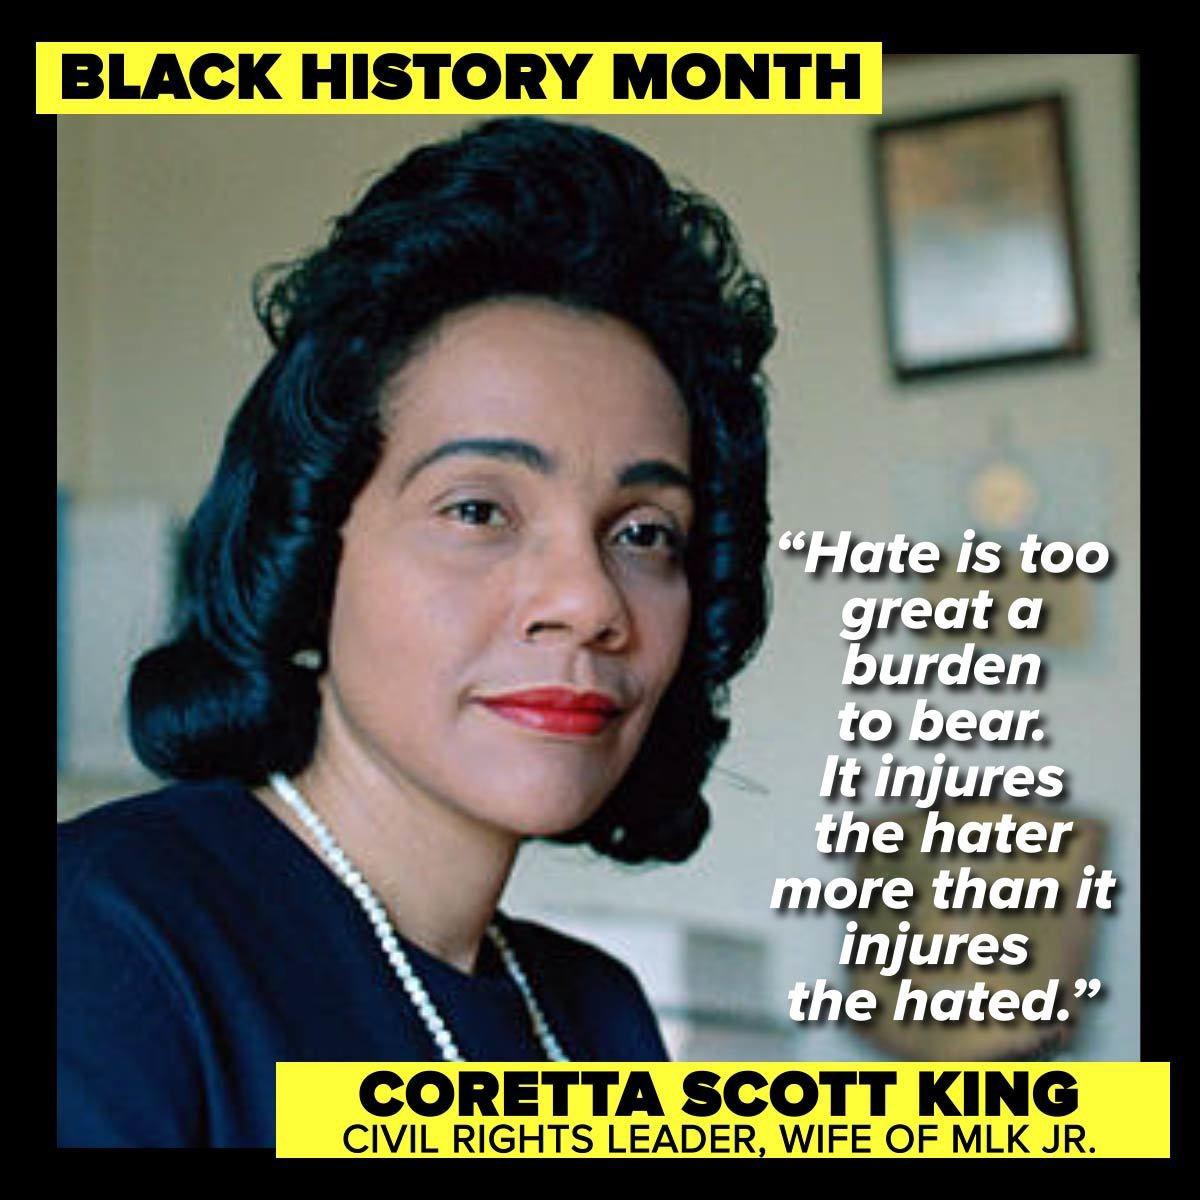 Black History 👥 is everyone's history. #BlackHistoryMatters 🖤 #CorettaScottKing #MartinLutherKingJr #BlackHistoryMonth 🧟🎈🧟♀️ #BlackHistory👣 #BlackHerStory